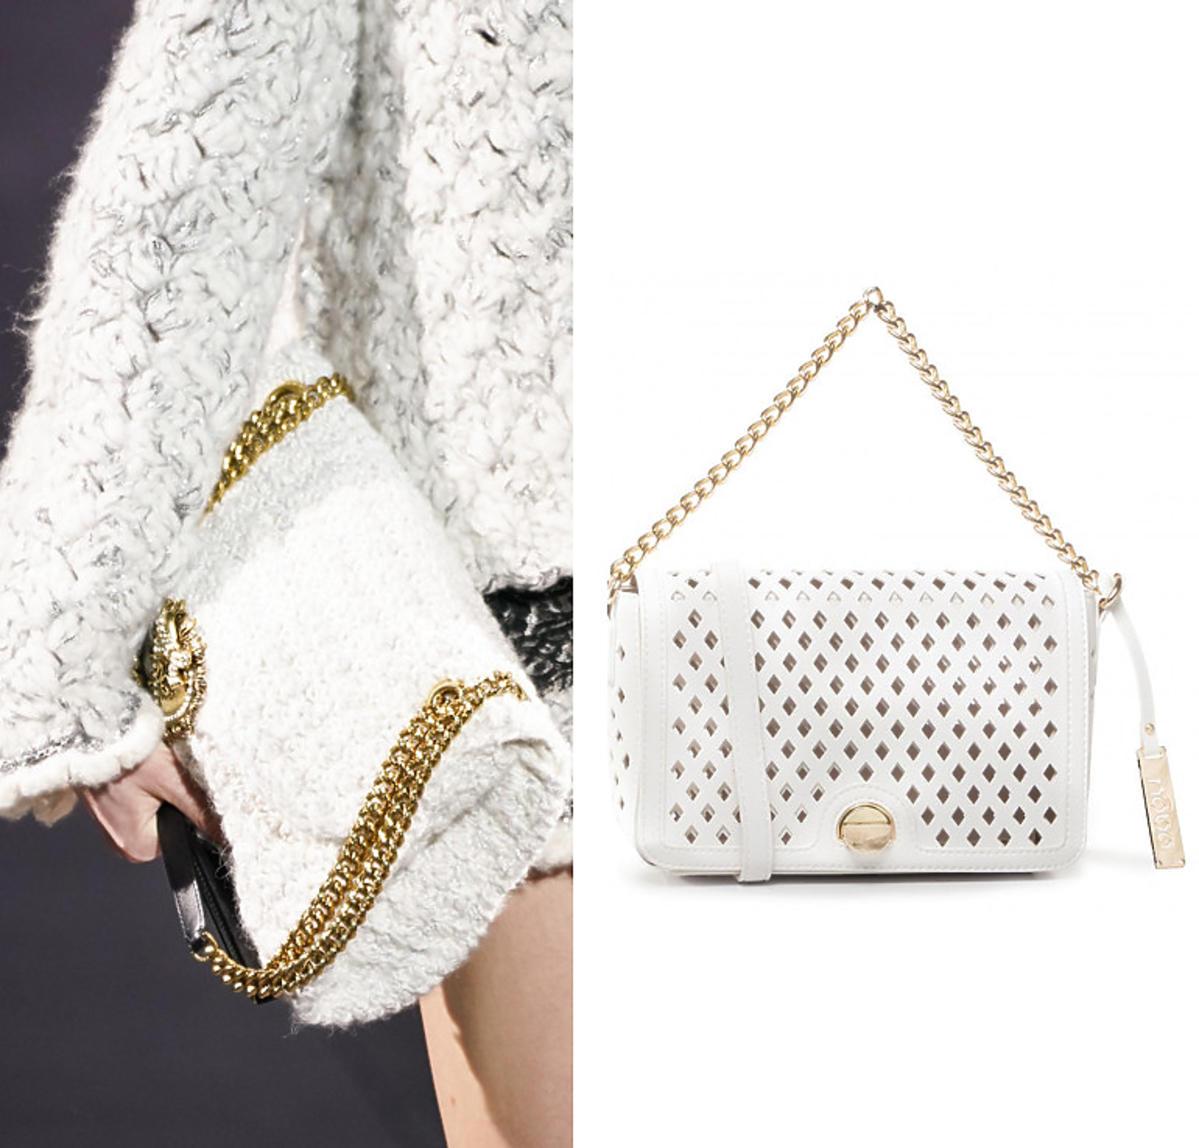 Biała torebka Dolce &Gabbana i torebka NOBO